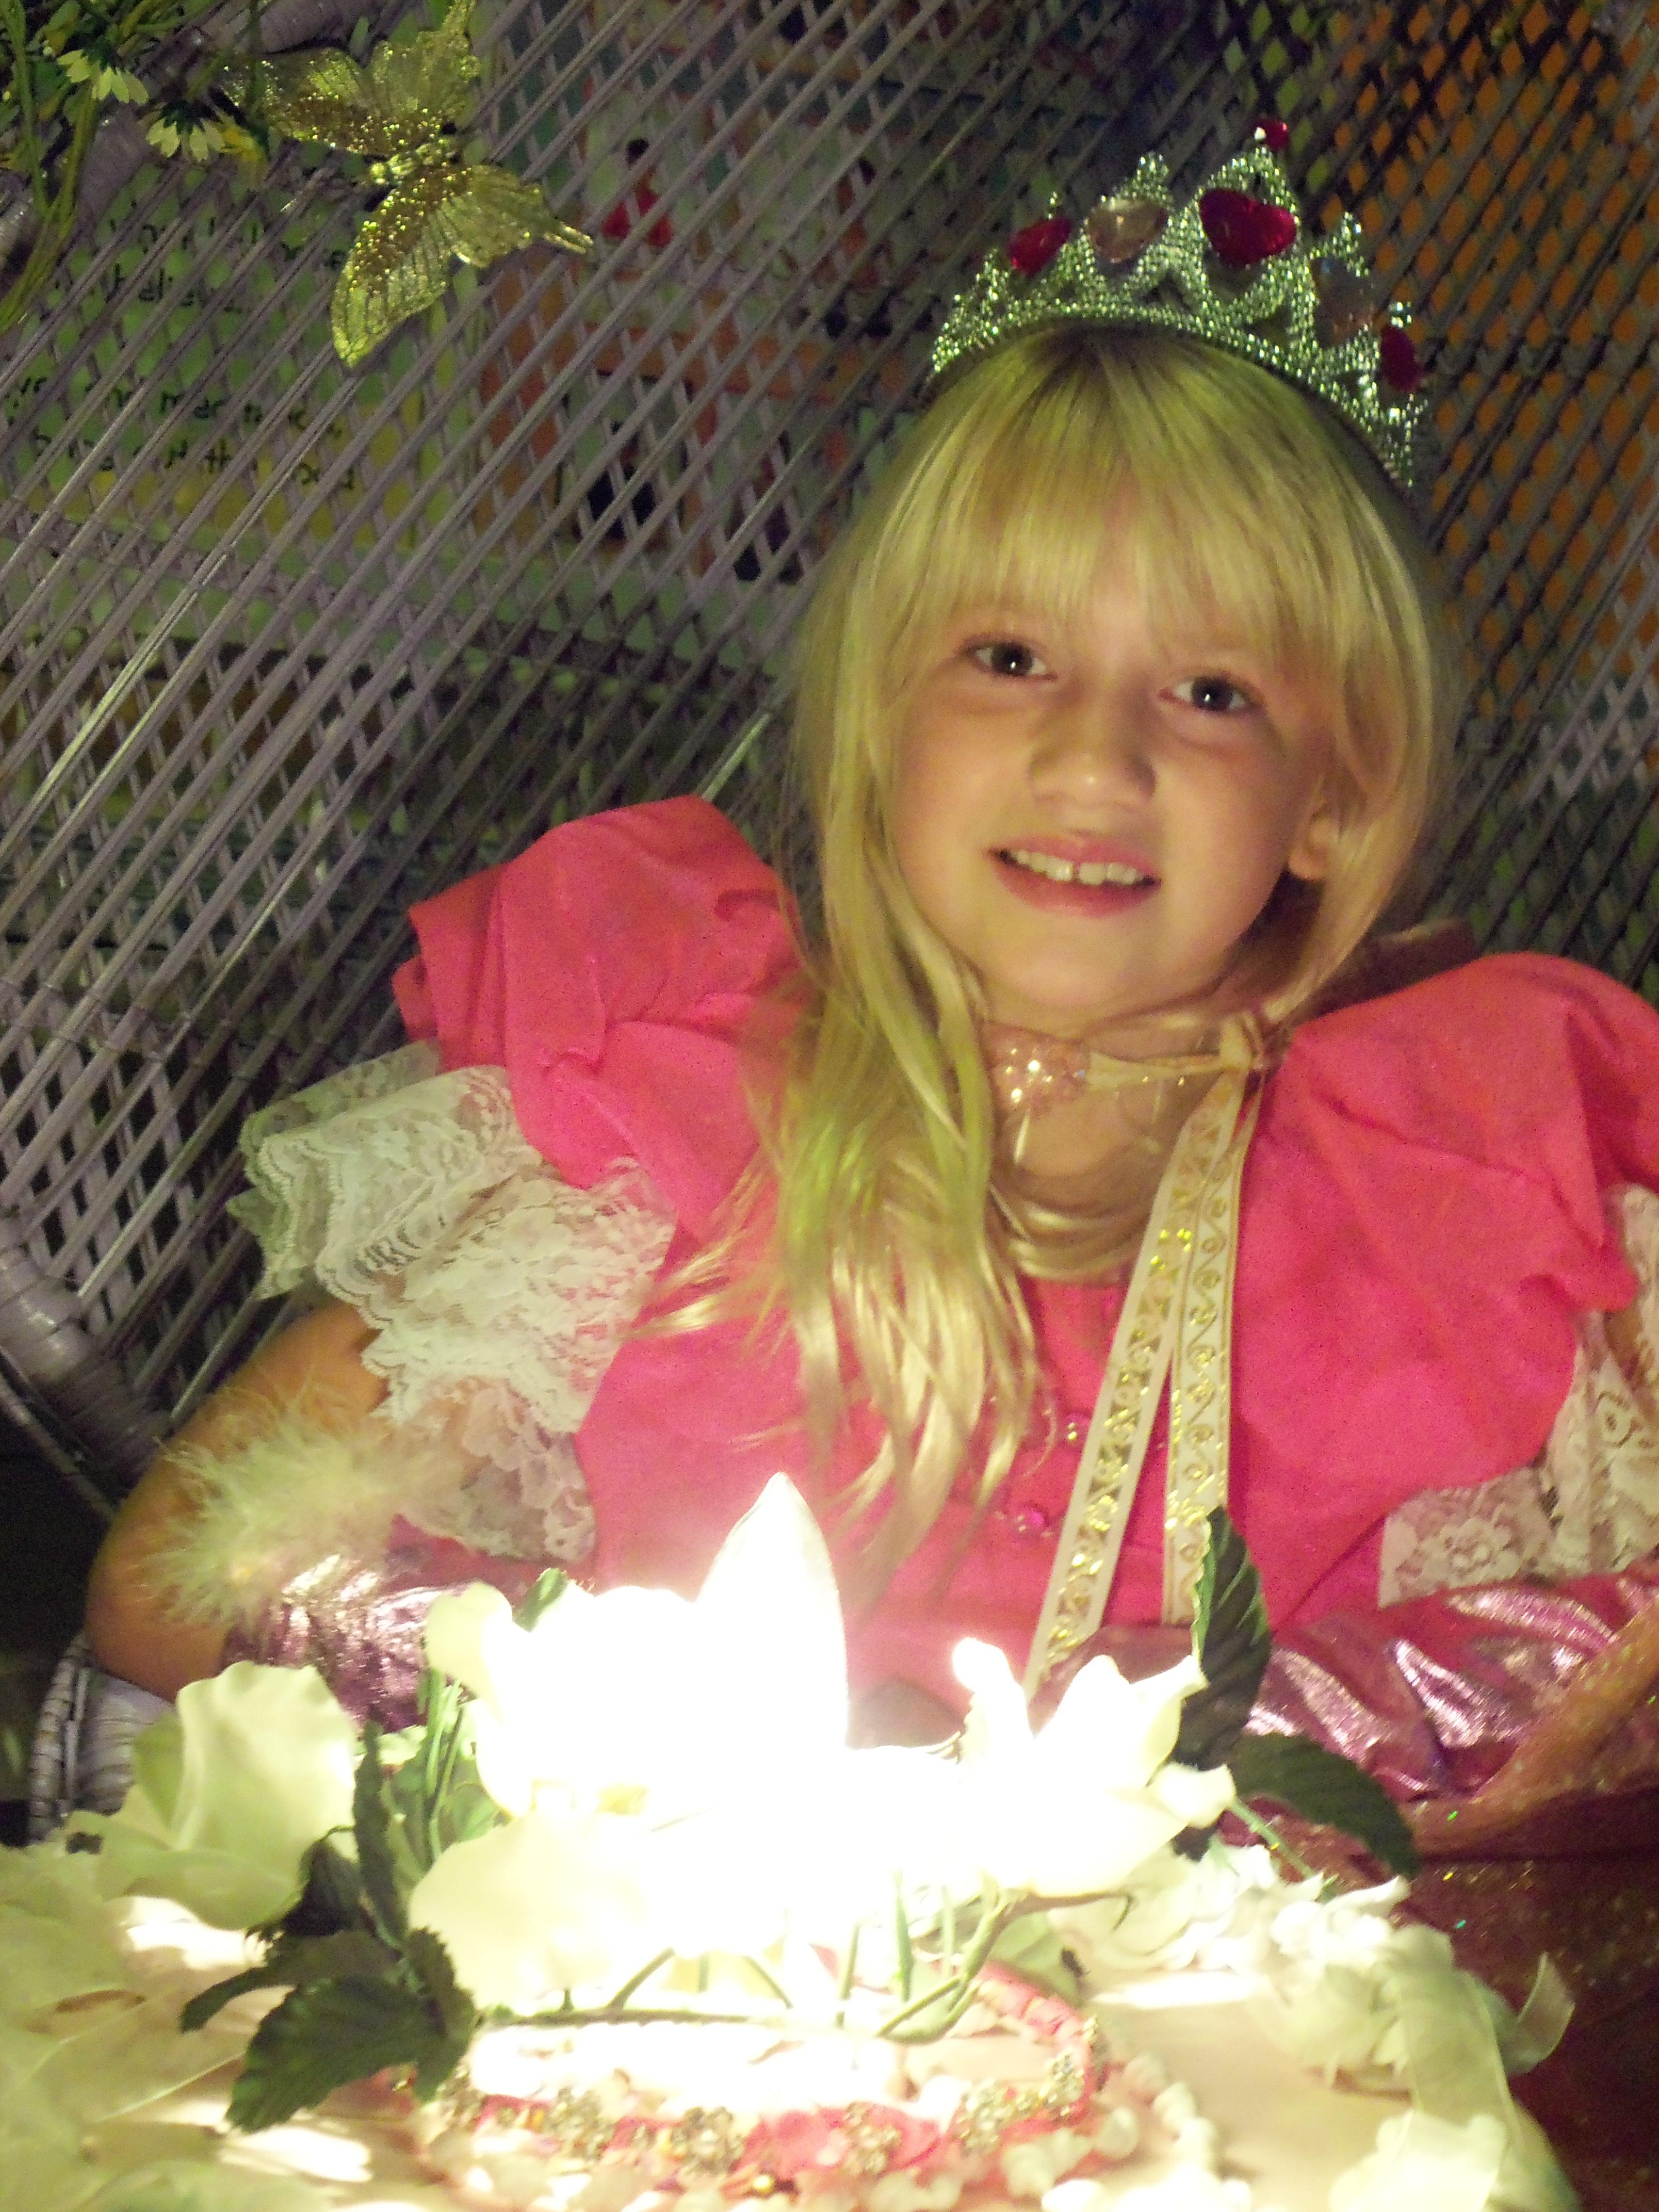 Krendoll princess smiling before the Krendoll cake